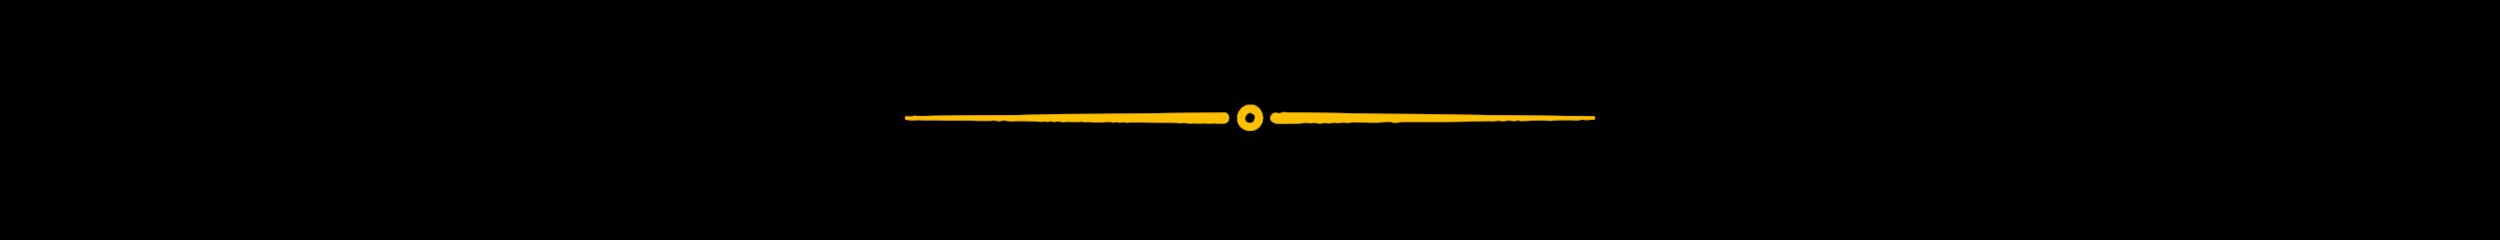 DeepBeer-bar3.png